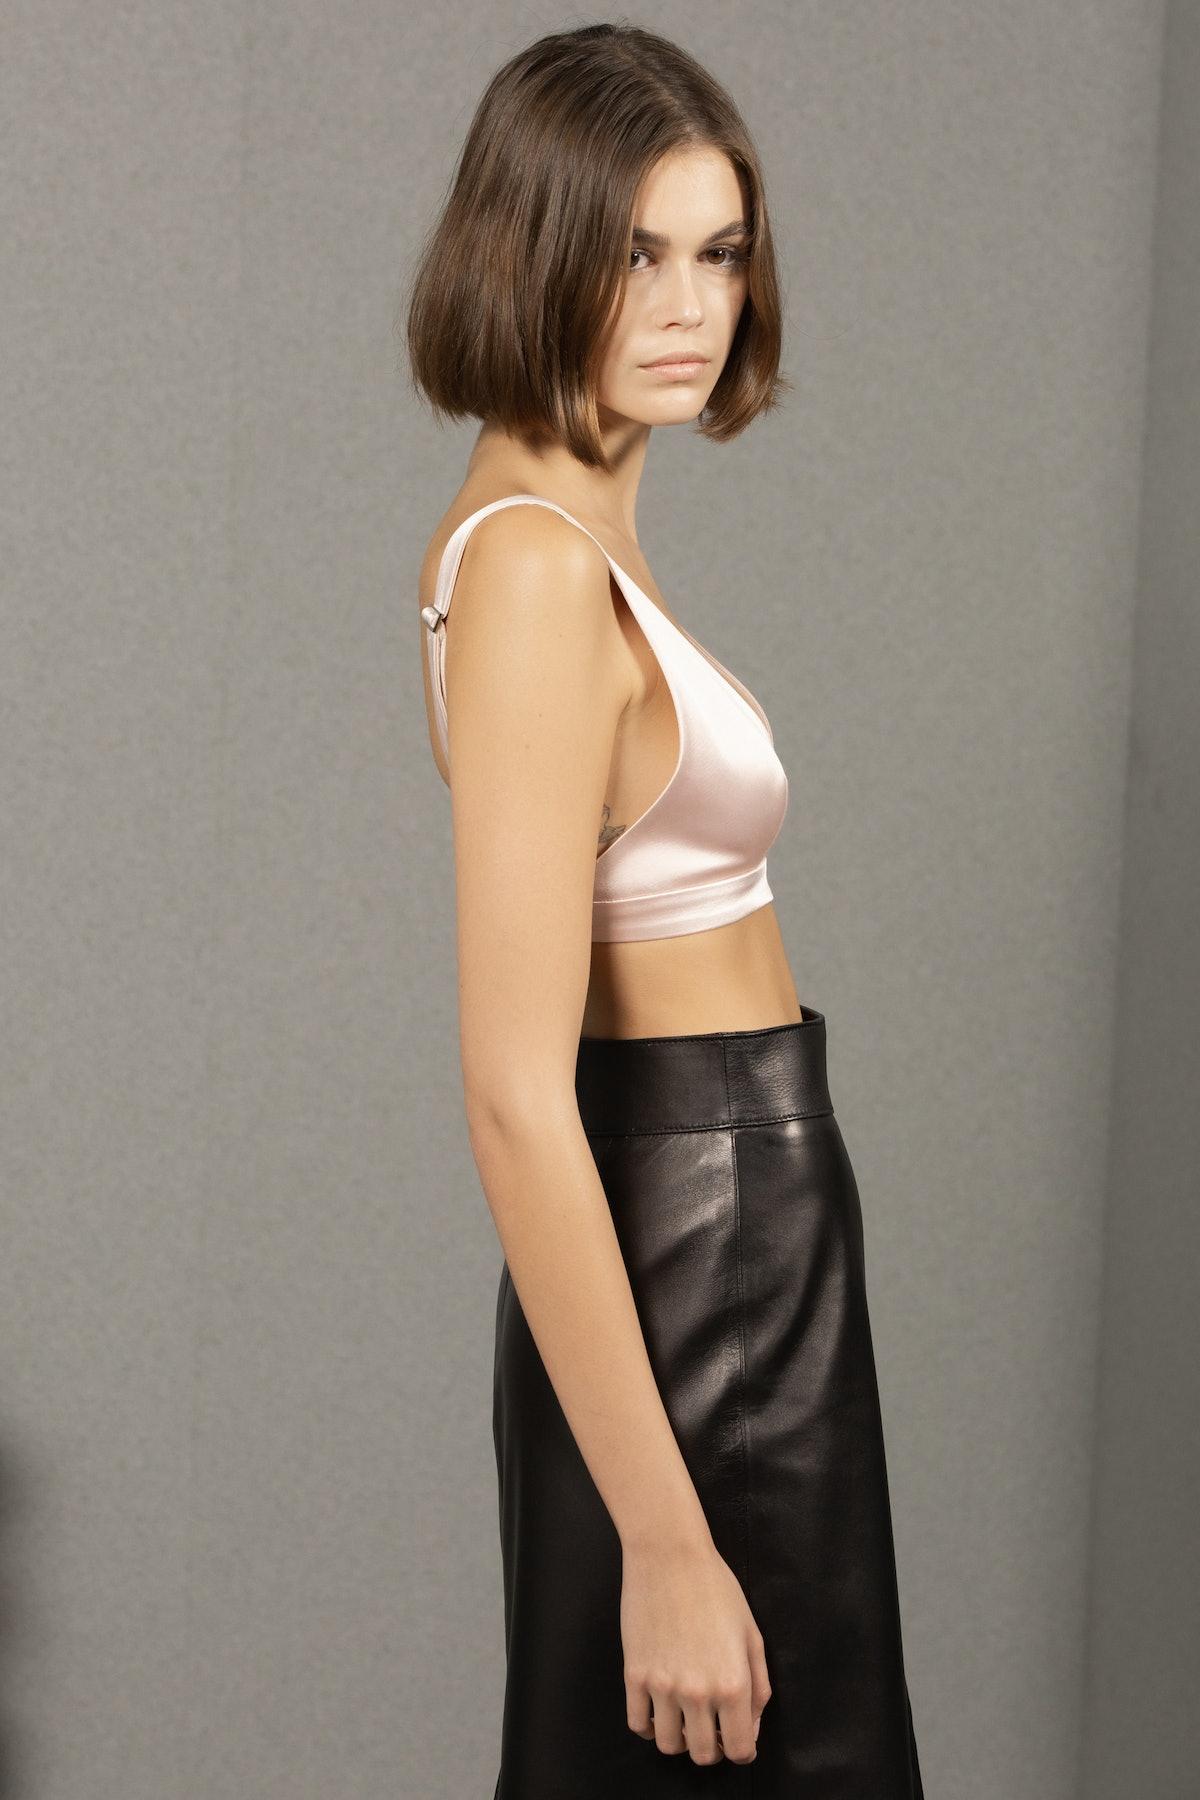 Serichai_Givenchy-118.jpg